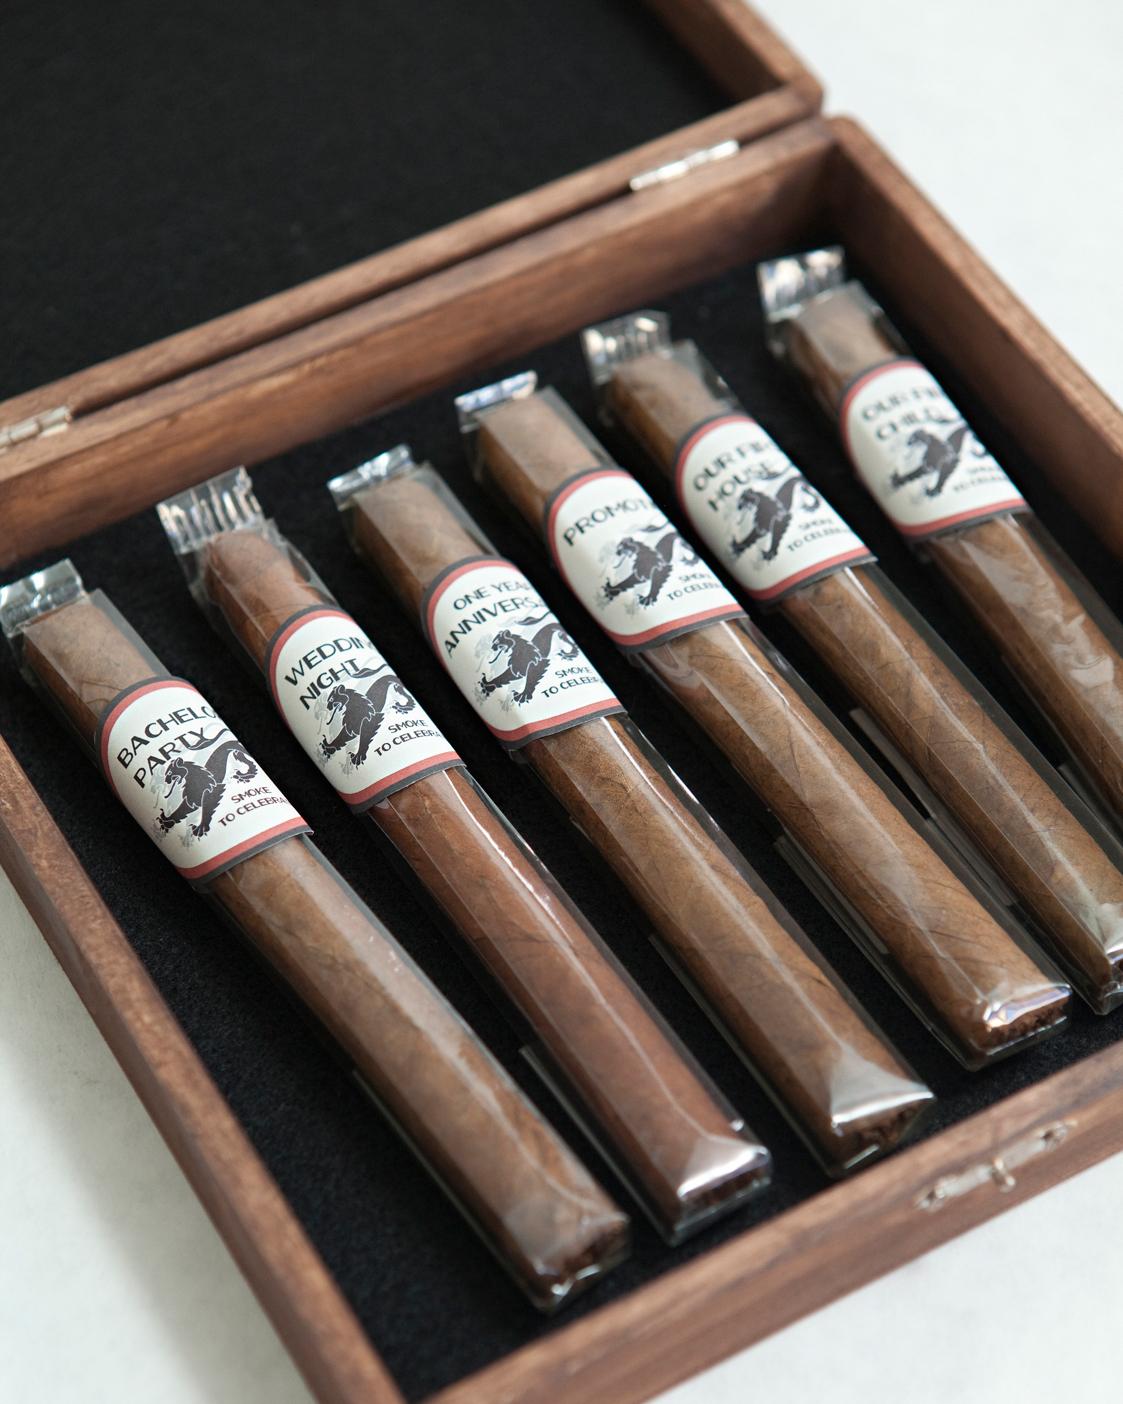 his-cigar-box-something-turquoise-cigars-in-box-0515.jpg